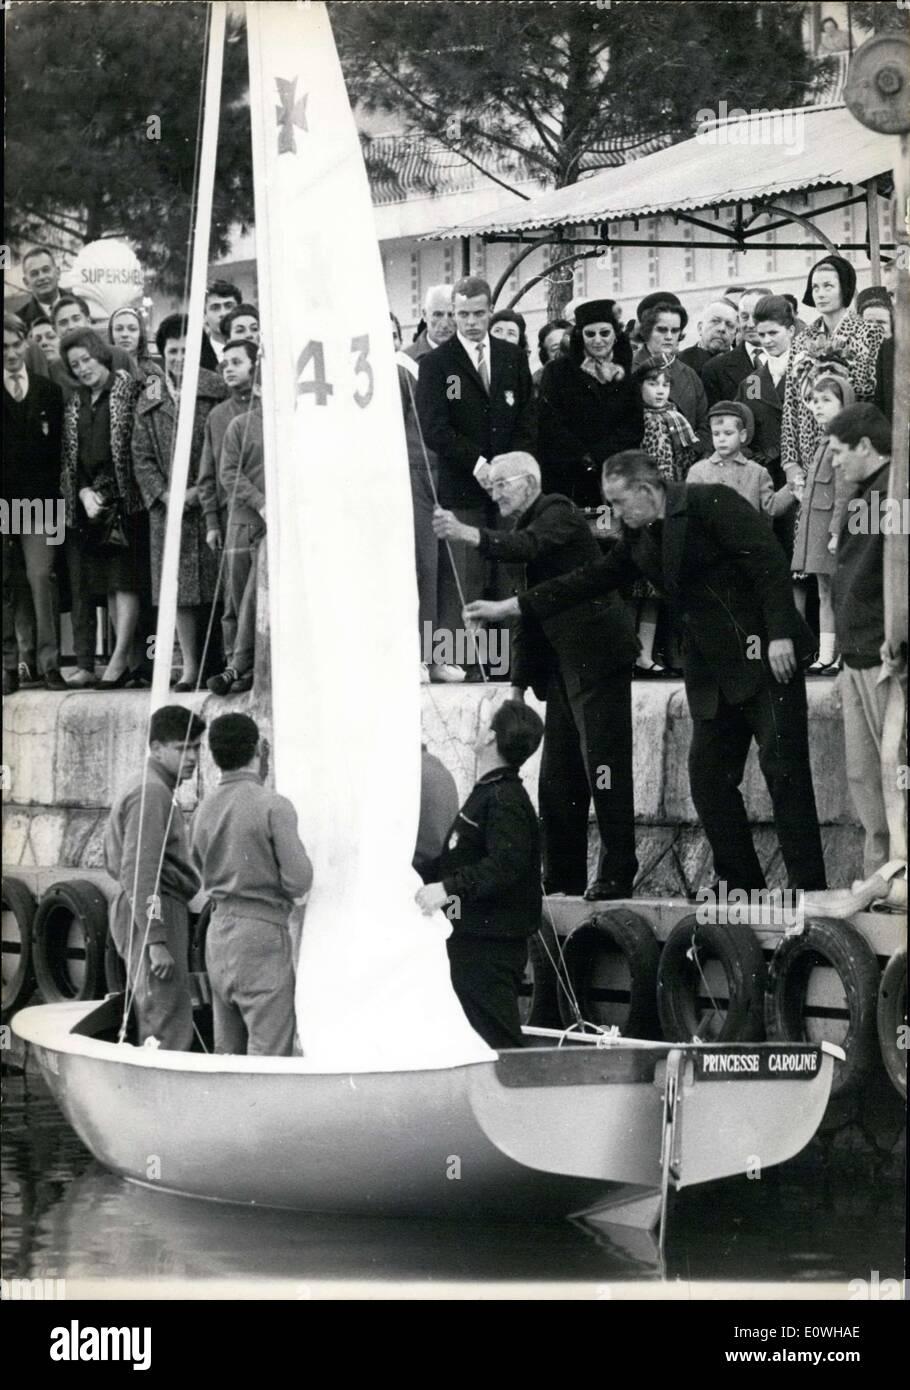 Jan. 28, 1963 - Monaco's Yacht Club Baptises the Caravel ''Princess Caroline' APRESS.c - Stock Image